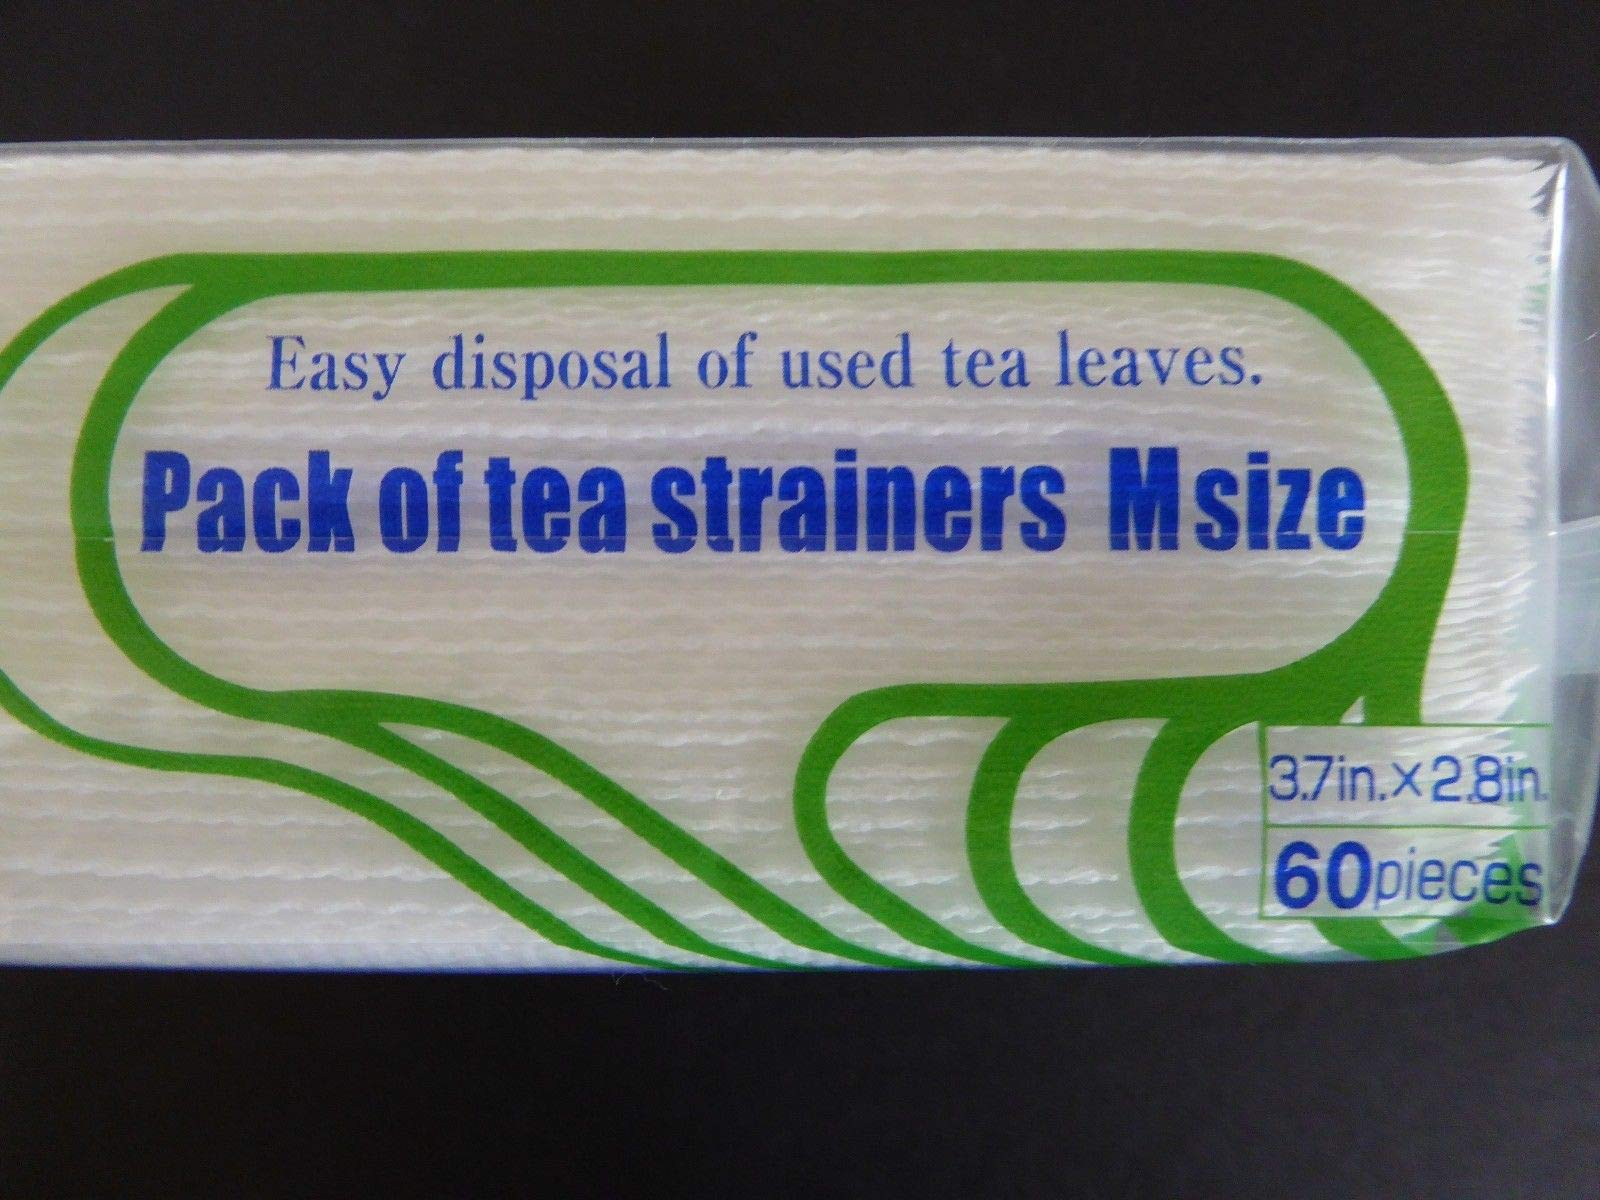 12 Packs (720 Pcs) Japanese TOKIWA Disposable Filter Bag/Tea, Coffee by Tokiwa Made Japan by YokohamaUSA